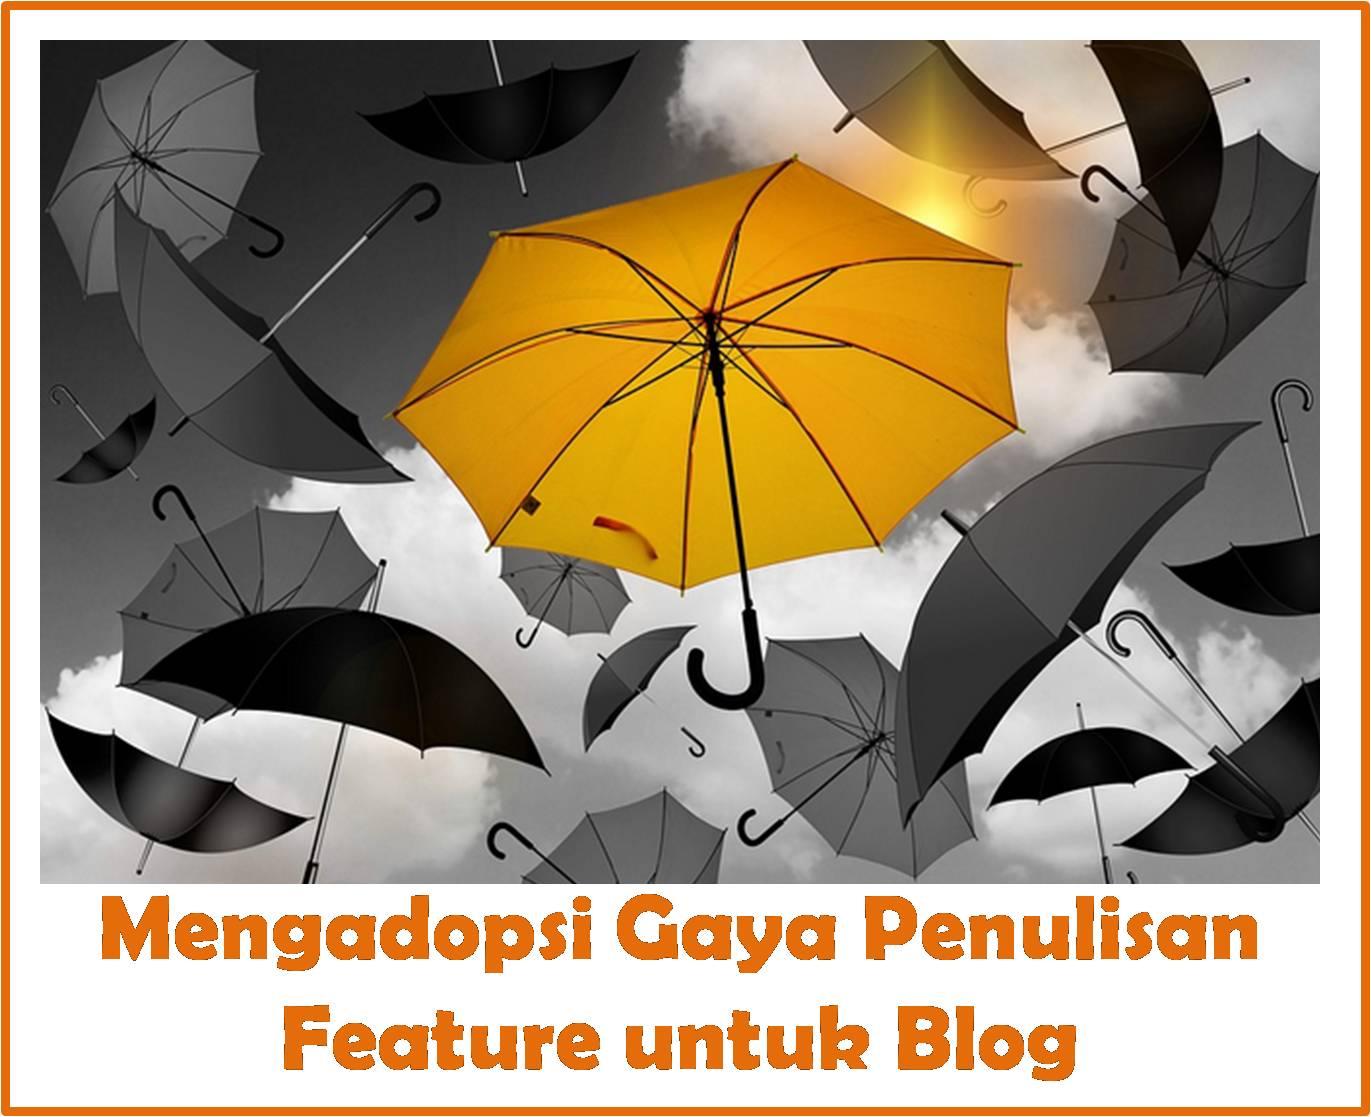 Feature untuk Blog